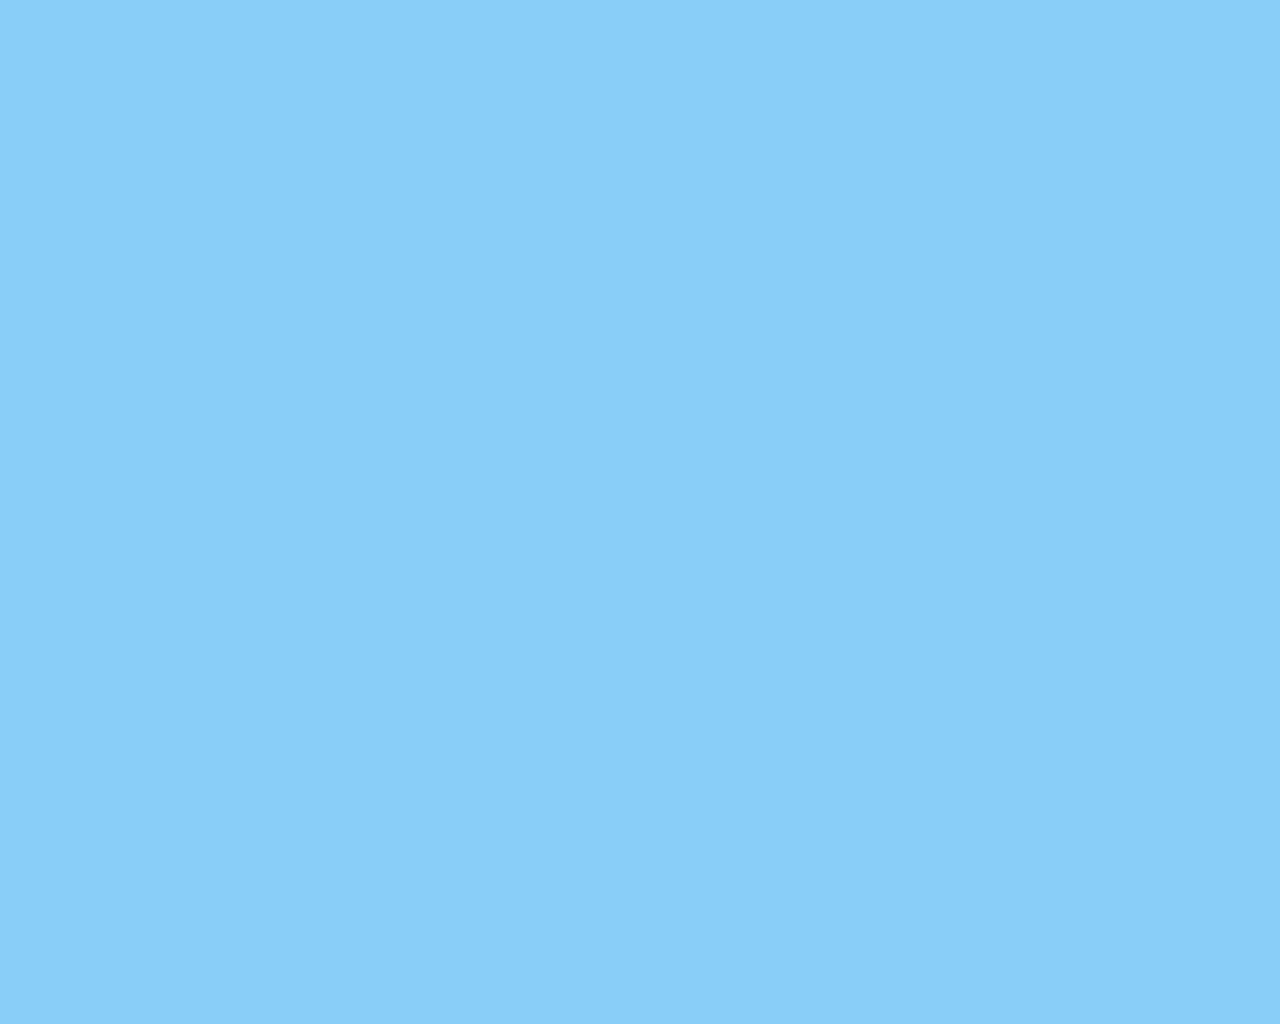 1280x1024-light-sky-blue-solid-color-background - vetmedwear